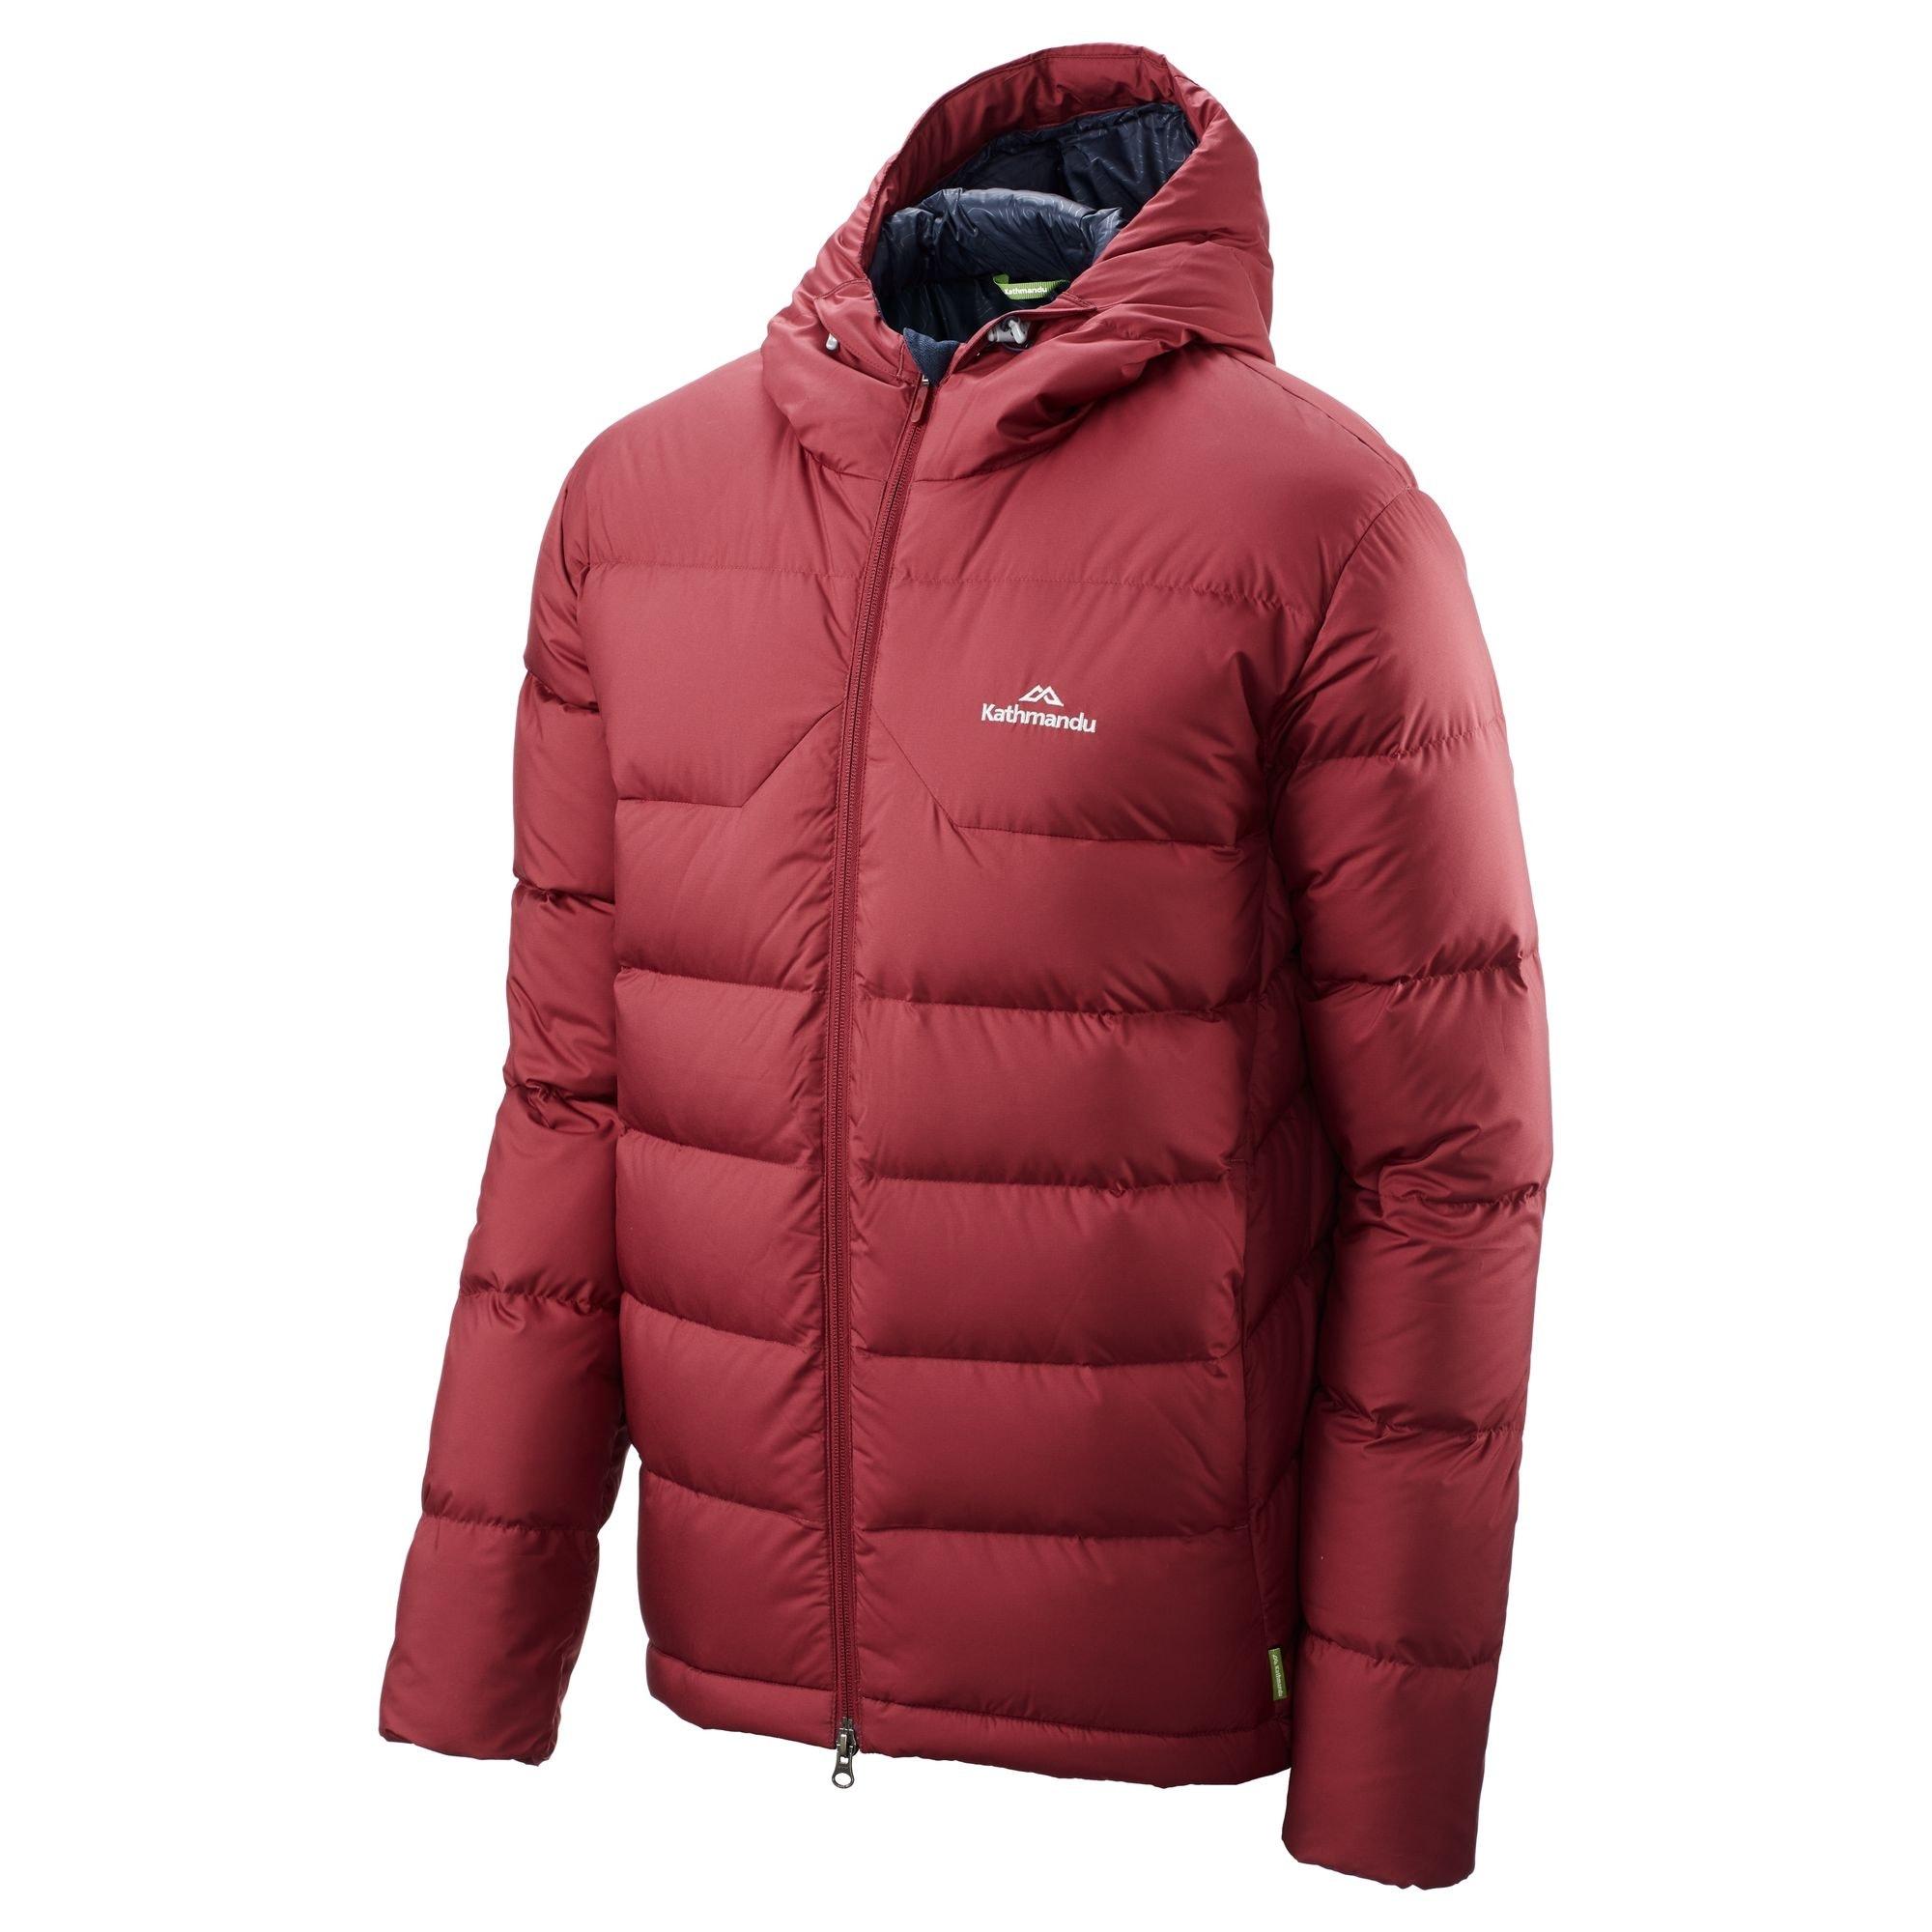 NEW-Kathmandu-Epiq-Men-039-s-Hooded-Warm-Winter-Duck-Down-Puffer-Jacket-v2 thumbnail 30